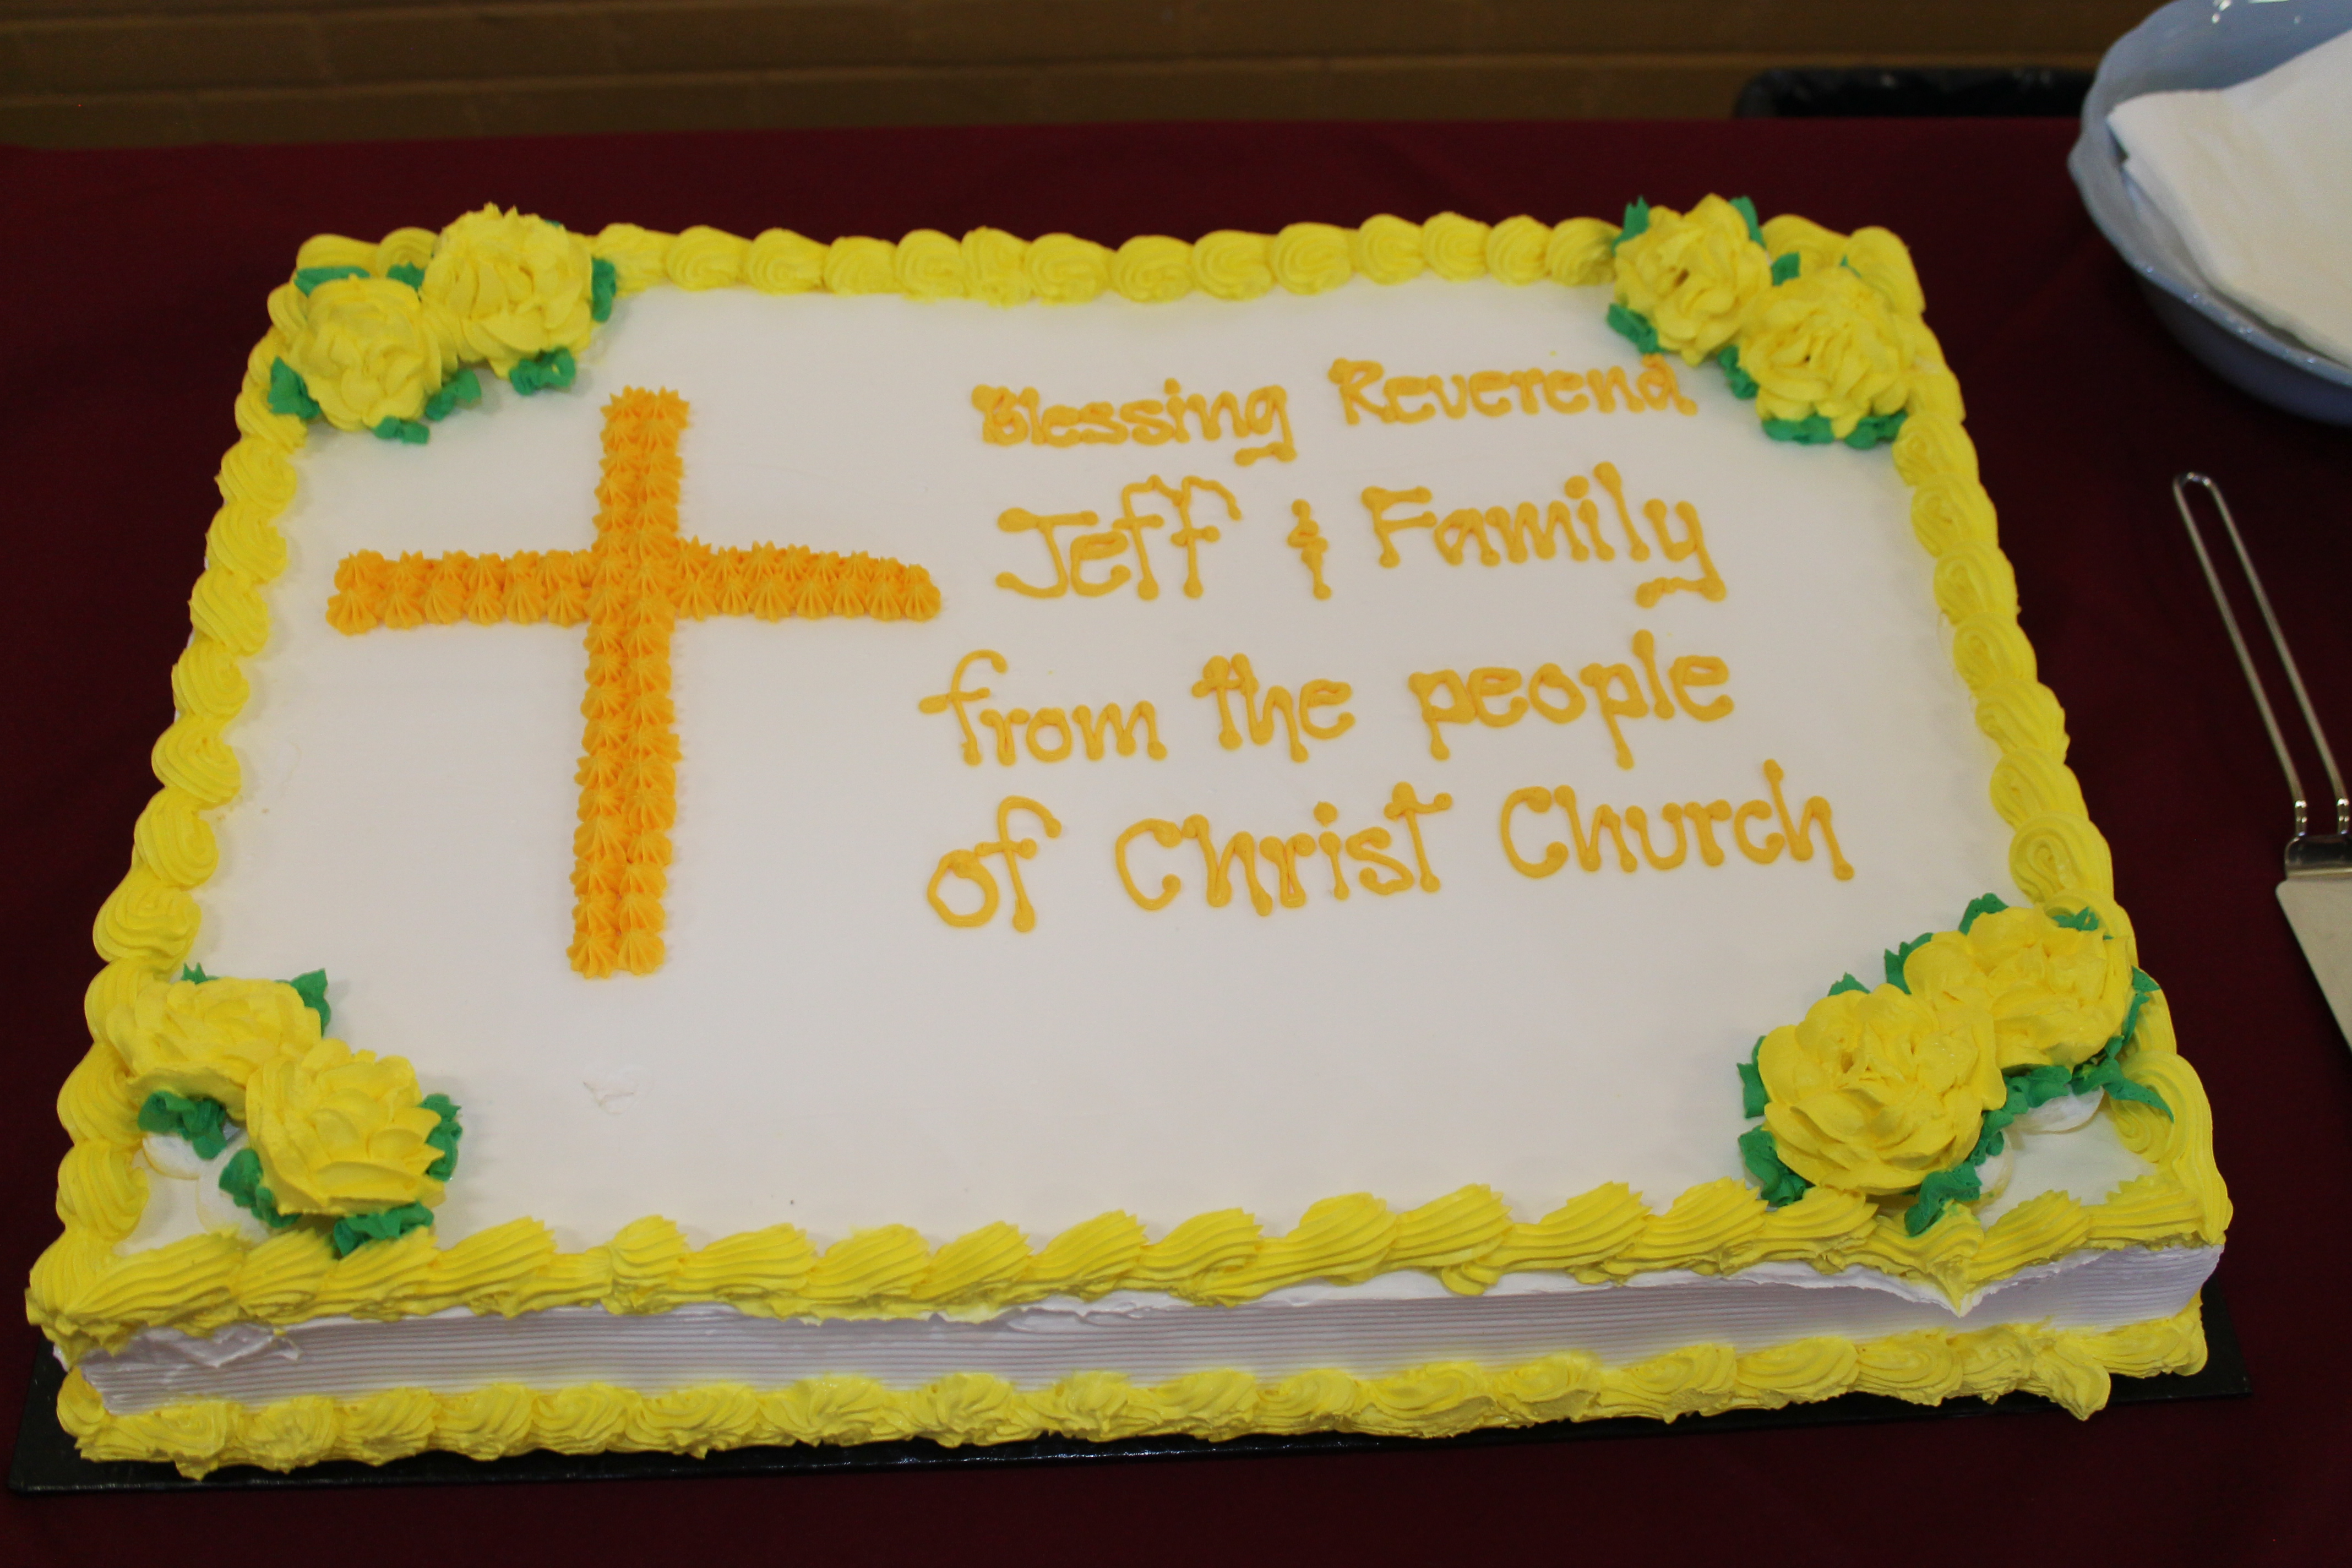 Cake.Nower's Last Sunday.Aug 26 18